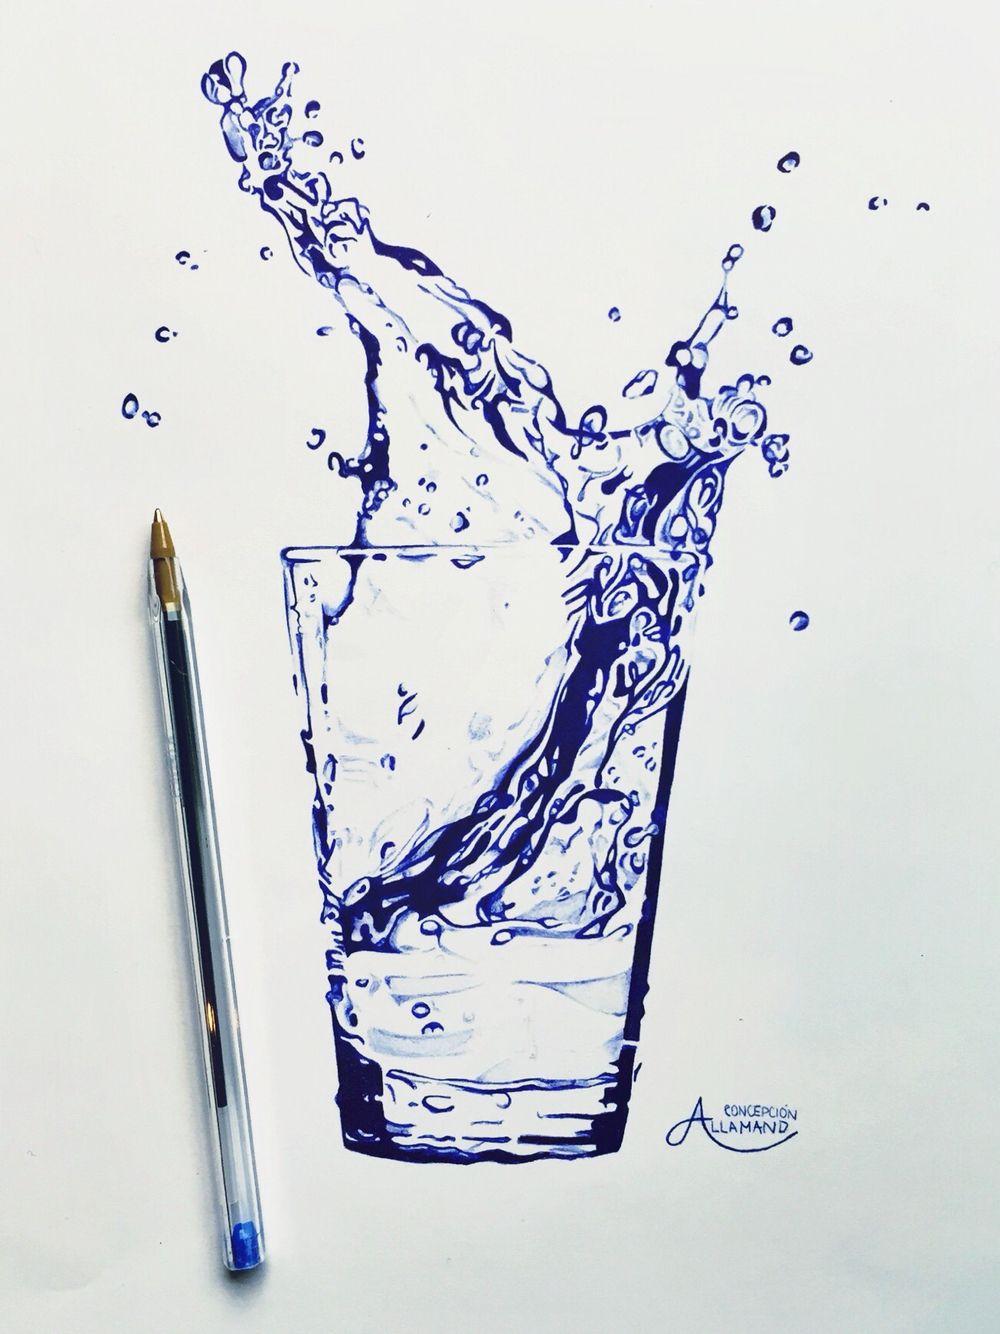 Bic pencil drawing, glass of water Concepción Allamand #glass #water #art #drawing #bic #pen #concepción #allamand